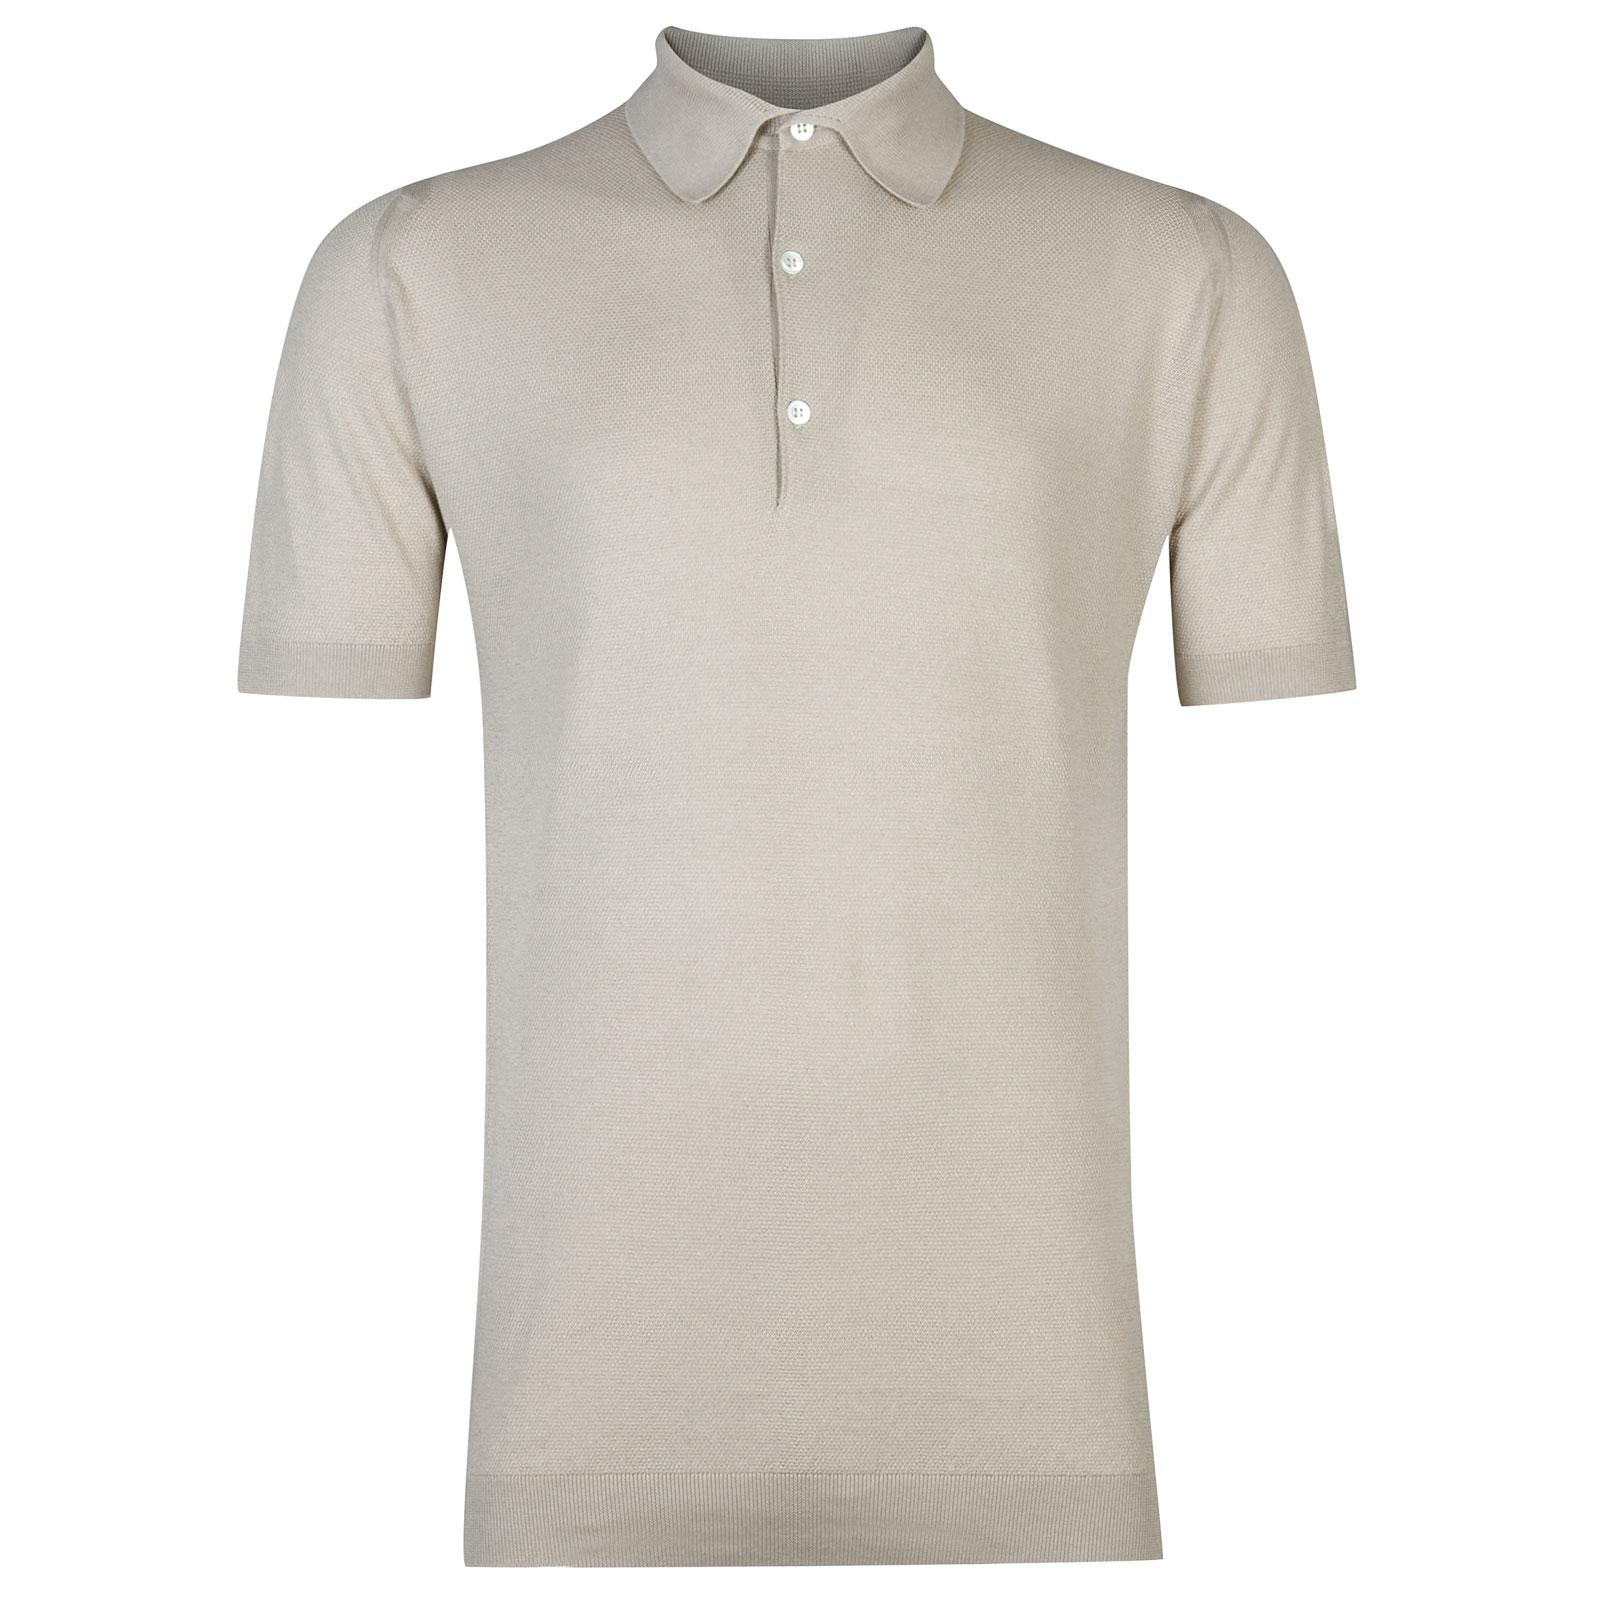 John Smedley Roth Sea Island Cotton Shirt in Brunel Beige-L